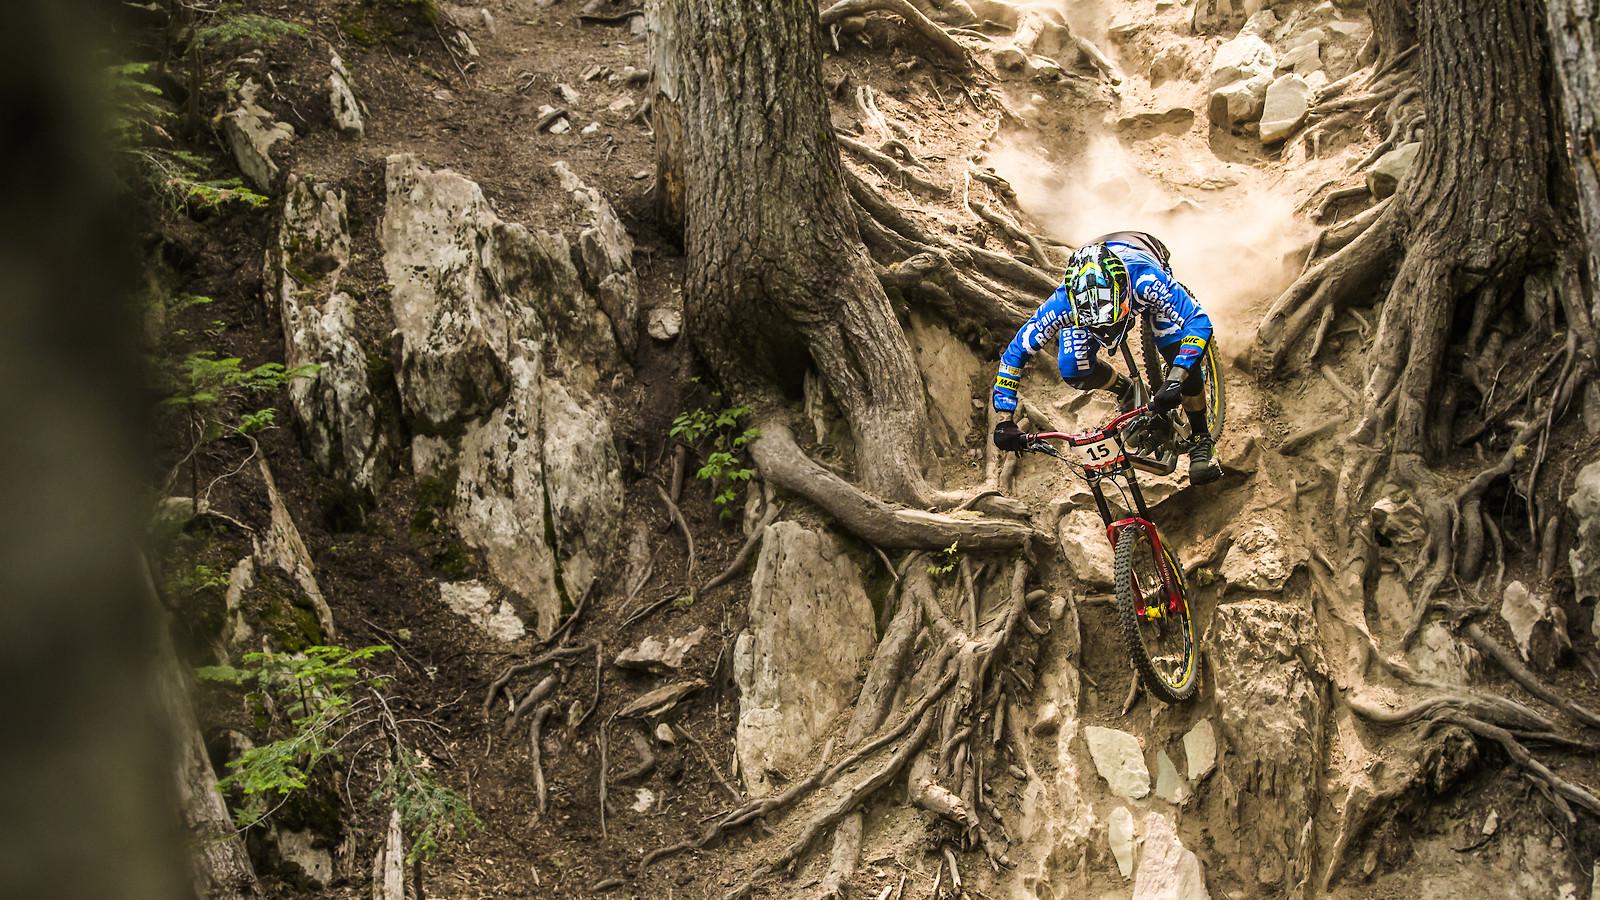 7 - phunkt.com - Mountain Biking Pictures - Vital MTB